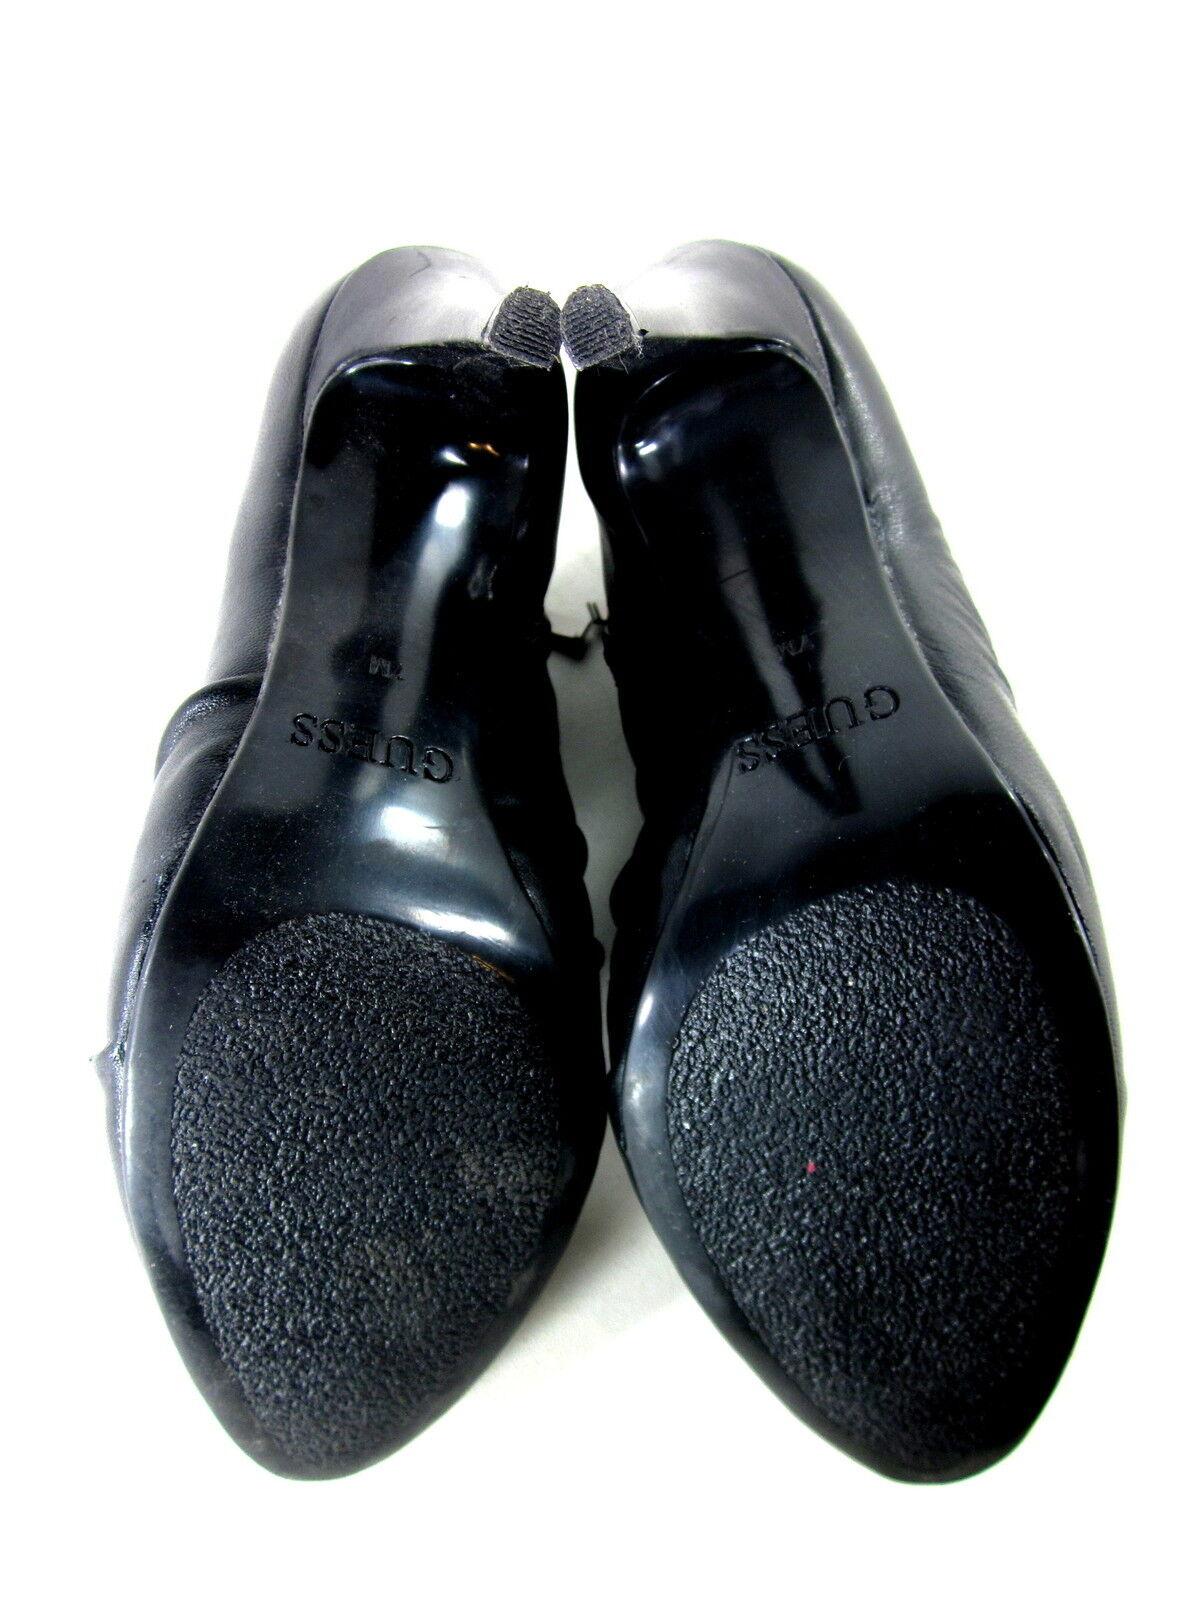 GUESS WOMEN'S US DOTTEST FASHION COMFORT BOOTIE BLACK HEEL LEATHER US WOMEN'S SIZE 7 MEDIUM 5fb1e9